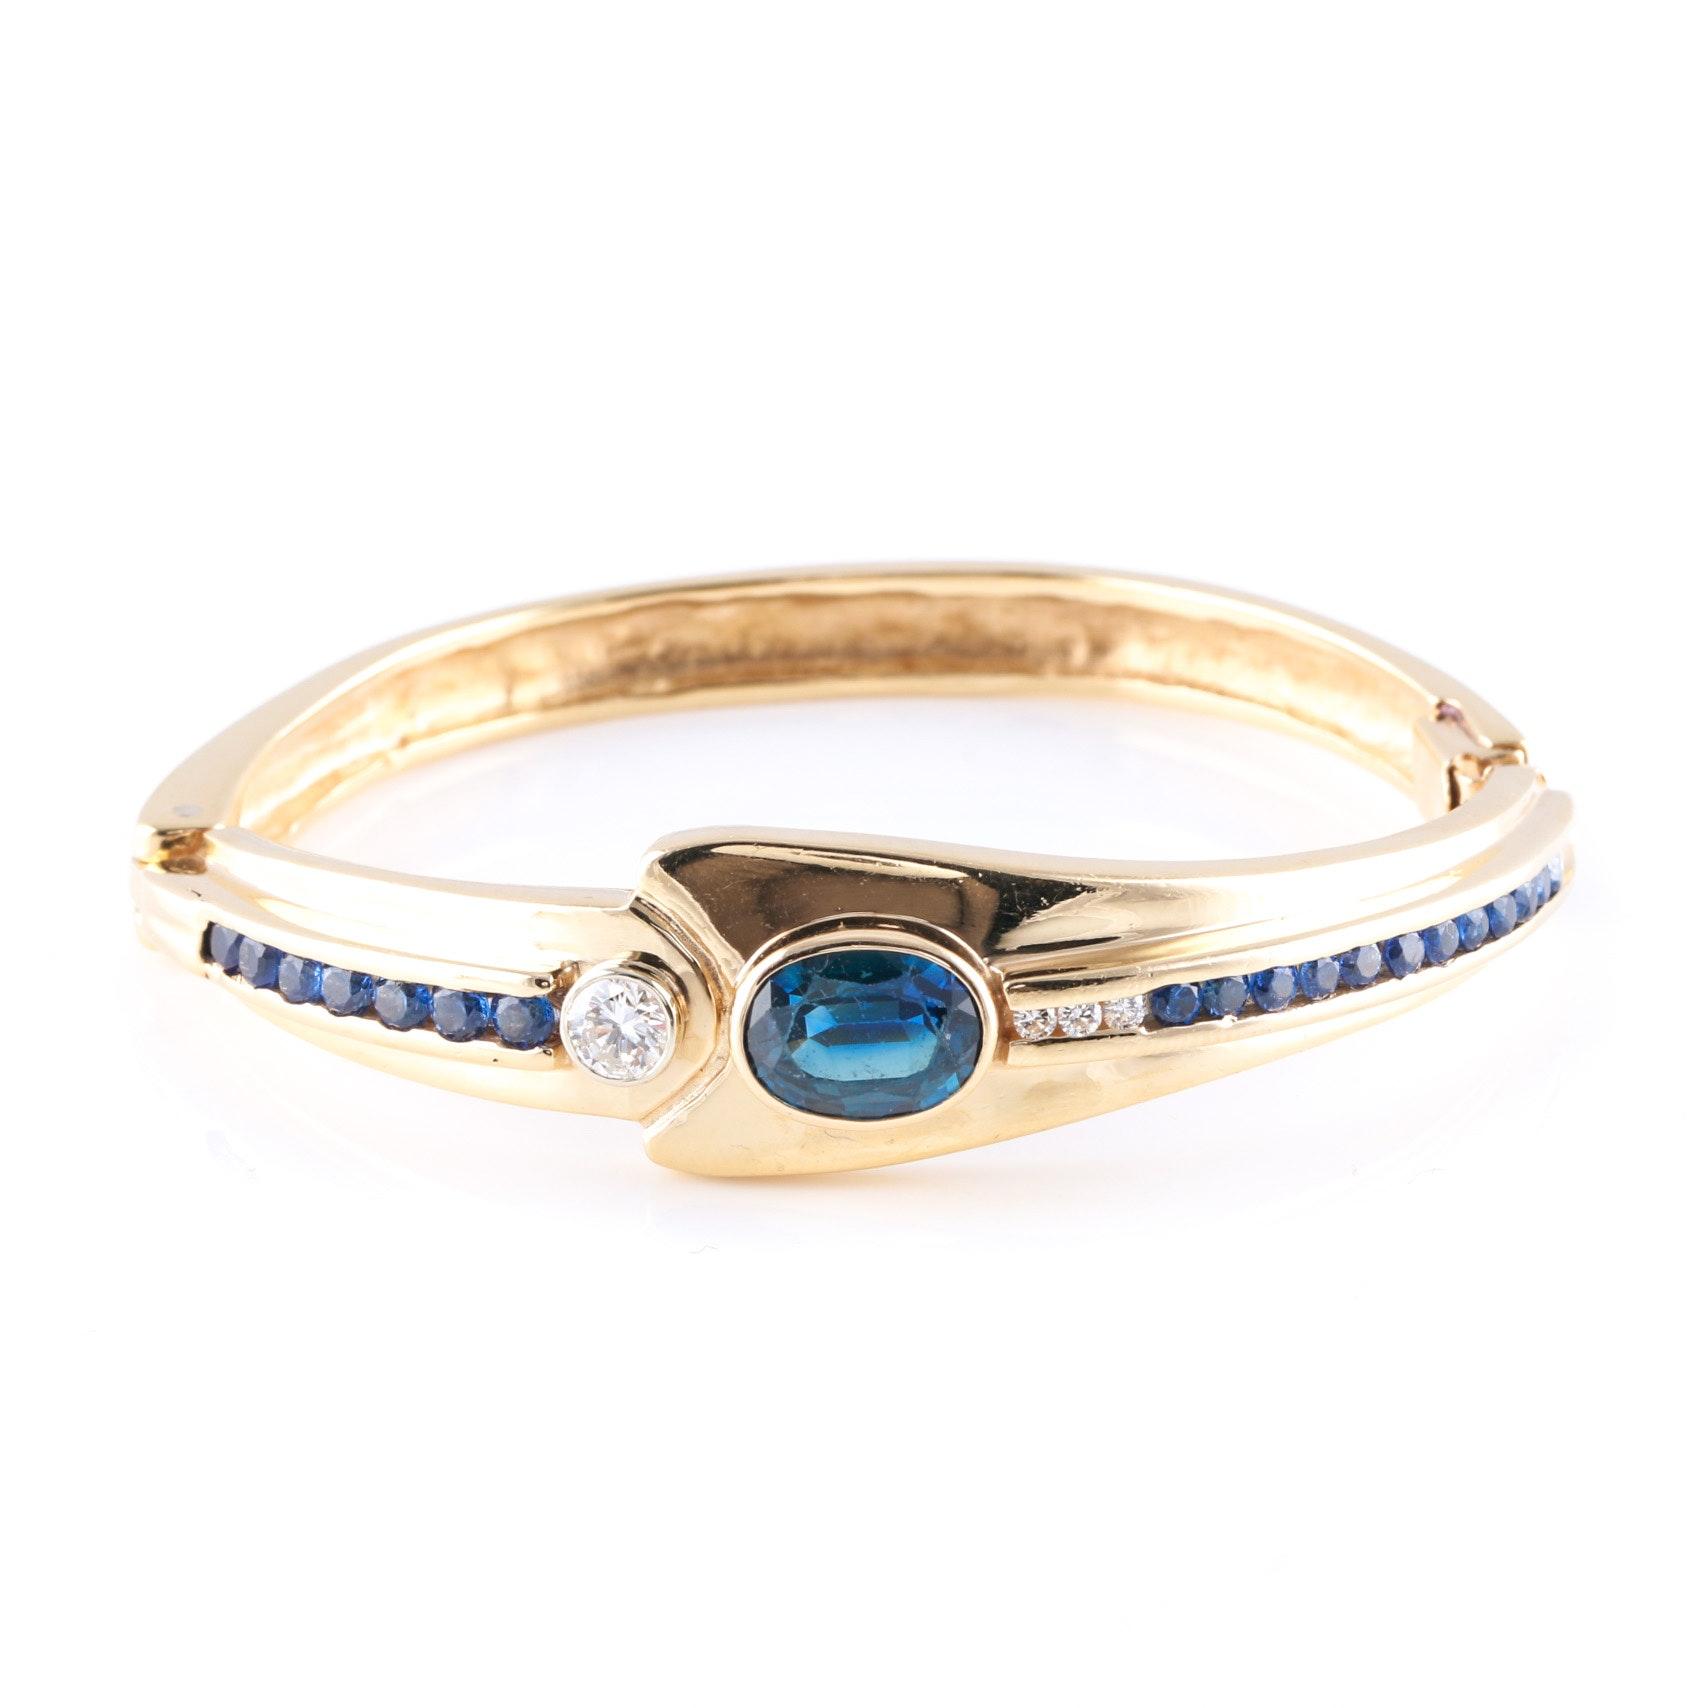 14K Gold Hinge Bracelet With Blue Sapphire and Diamonds